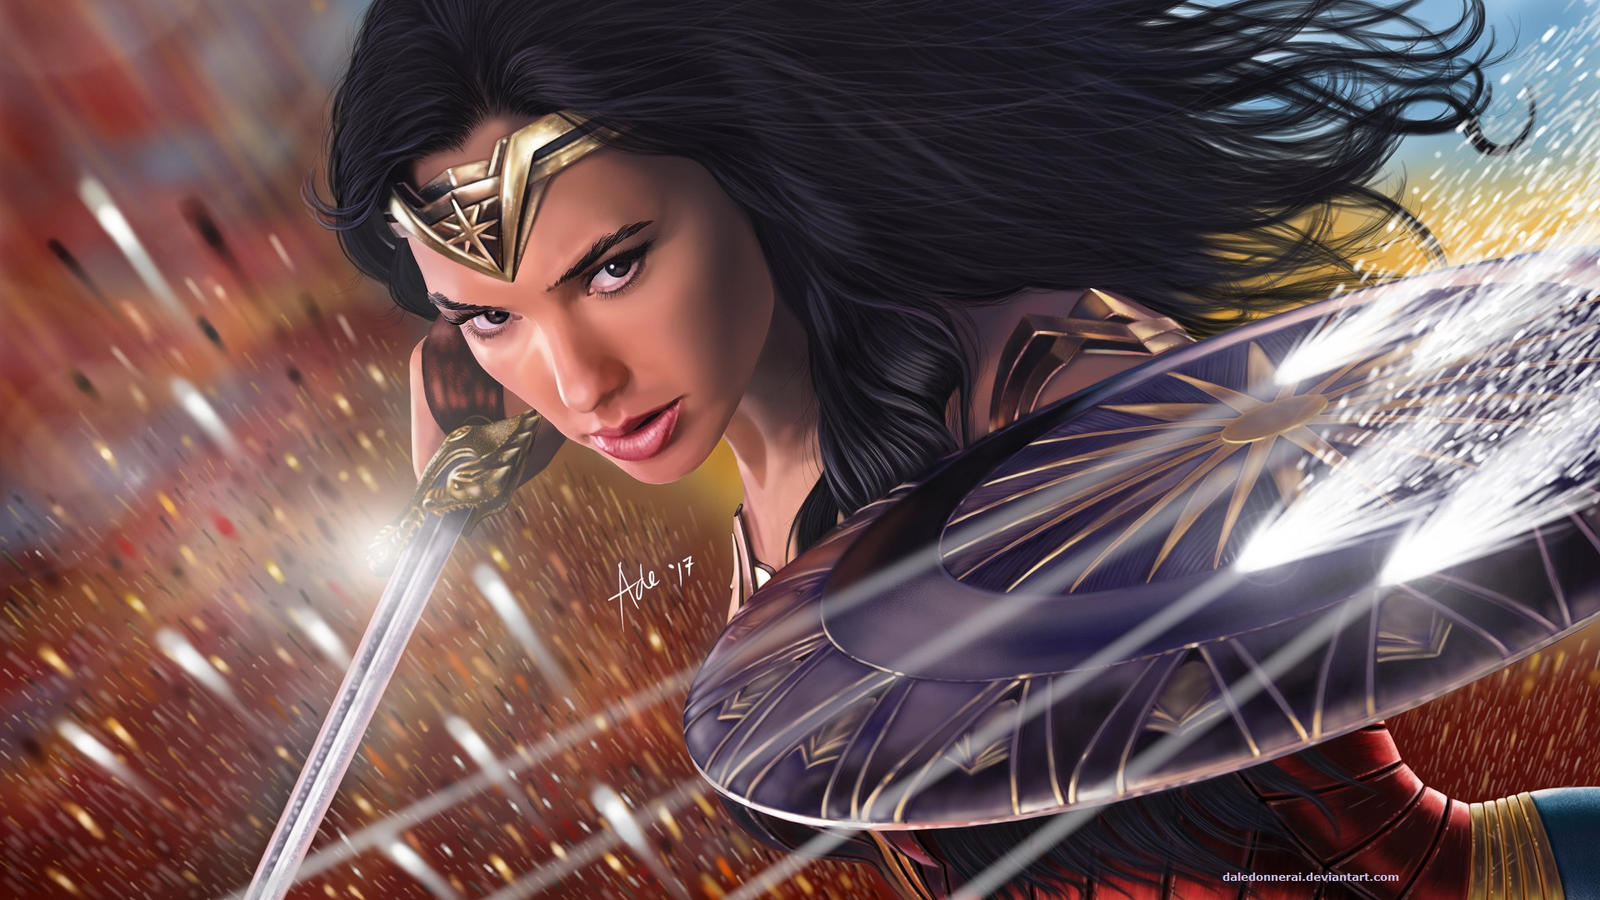 Wonder Woman 2017 Desktop Wallpaper: Wonder Woman (Desktop Wallpaper For Fans @ 1080p) By